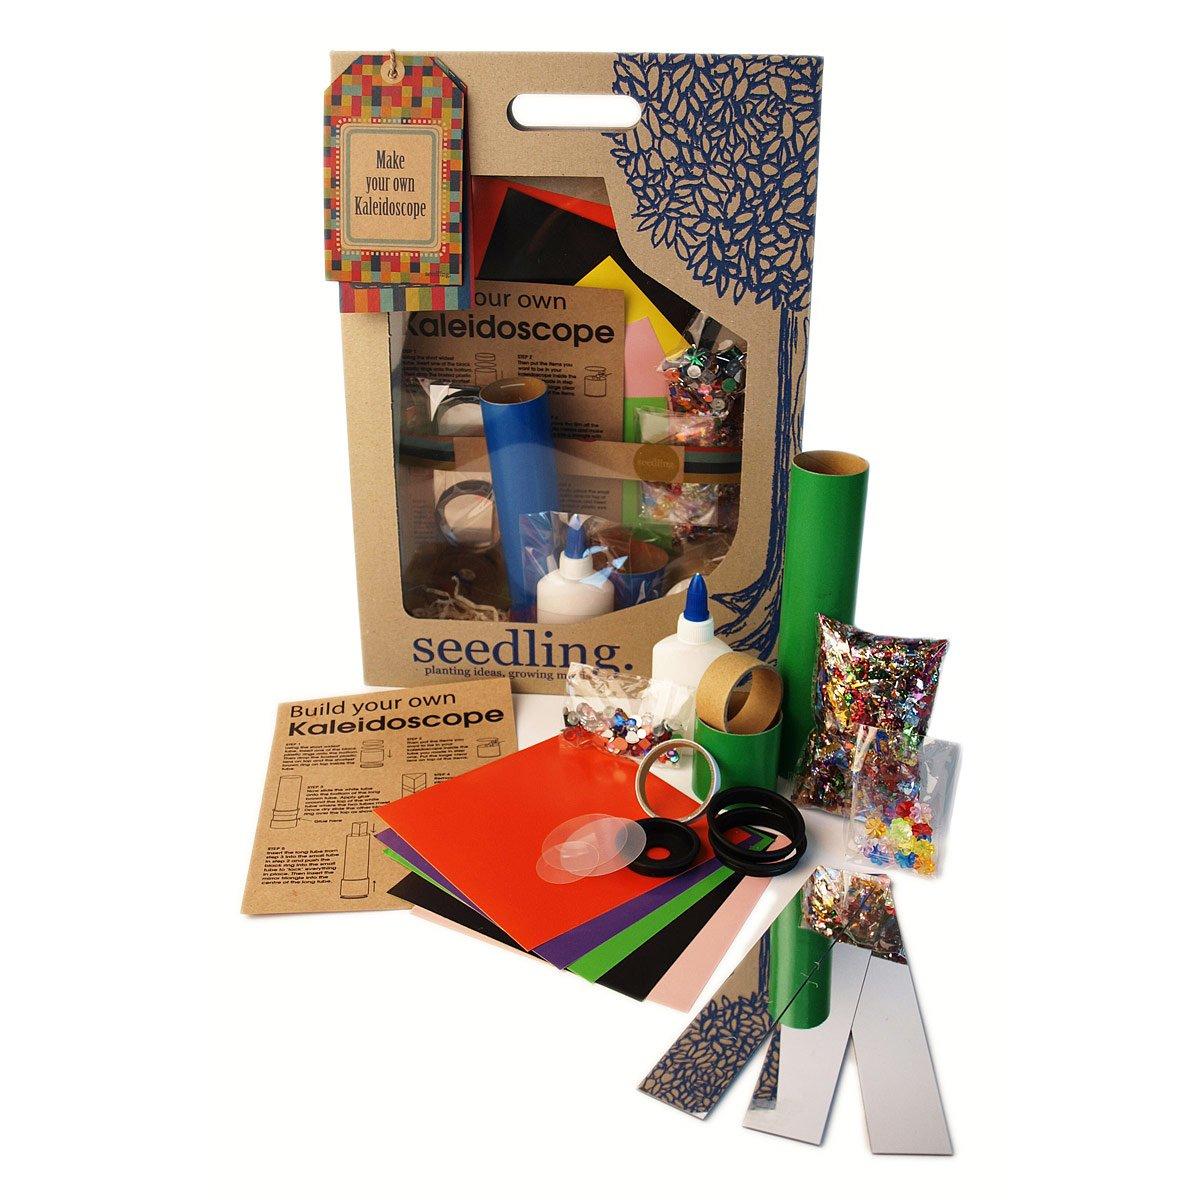 Diy Toys: Make Your Own Kaleidoscope Set